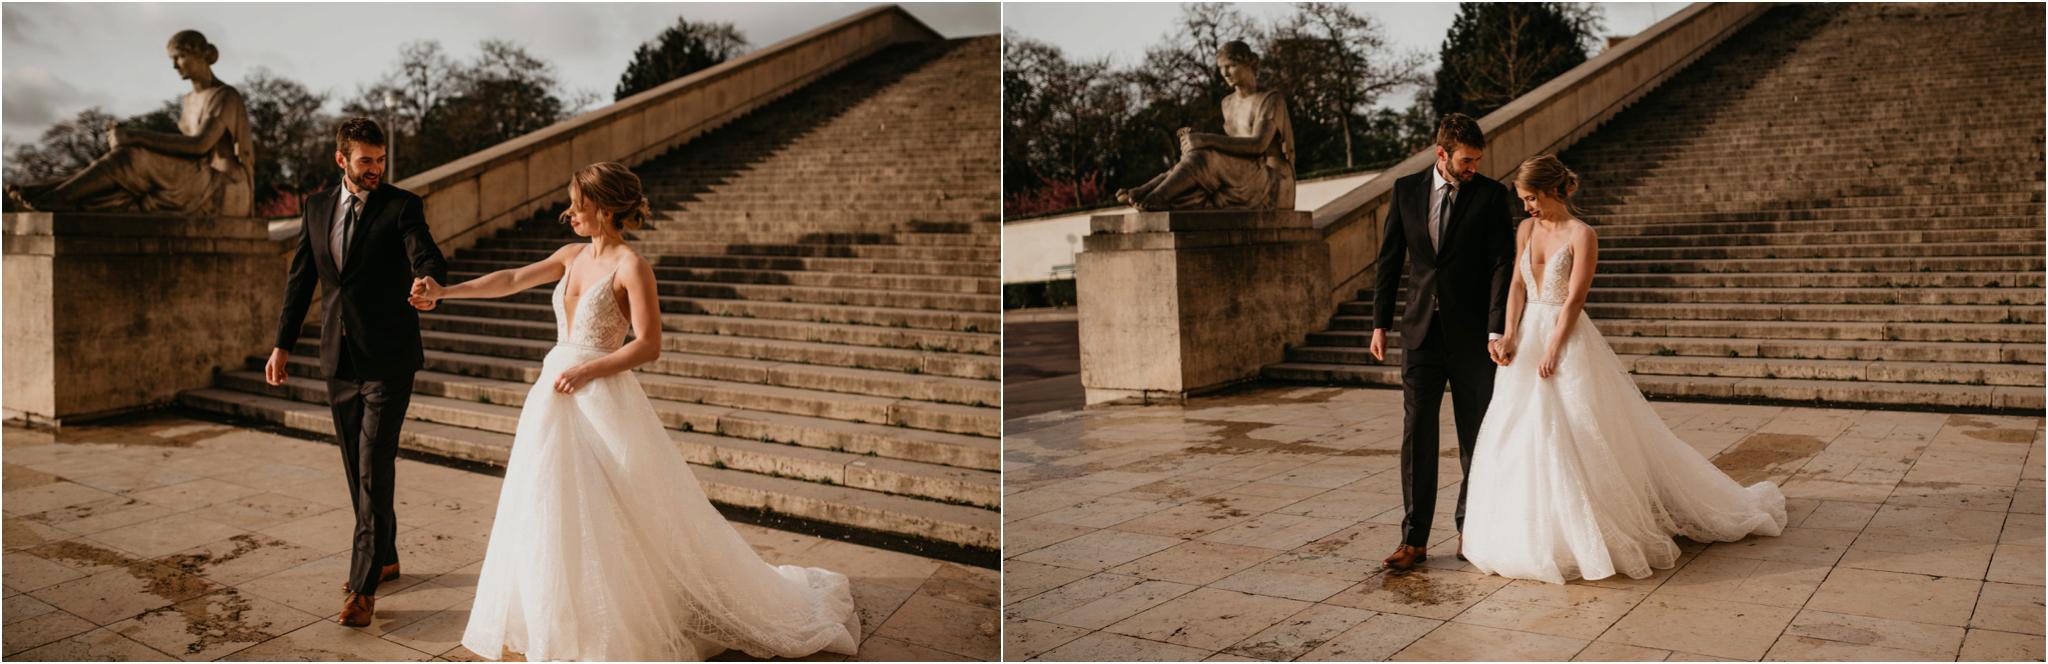 miranda-and-jared-paris-elopement-destination-wedding-photographer-073.jpg